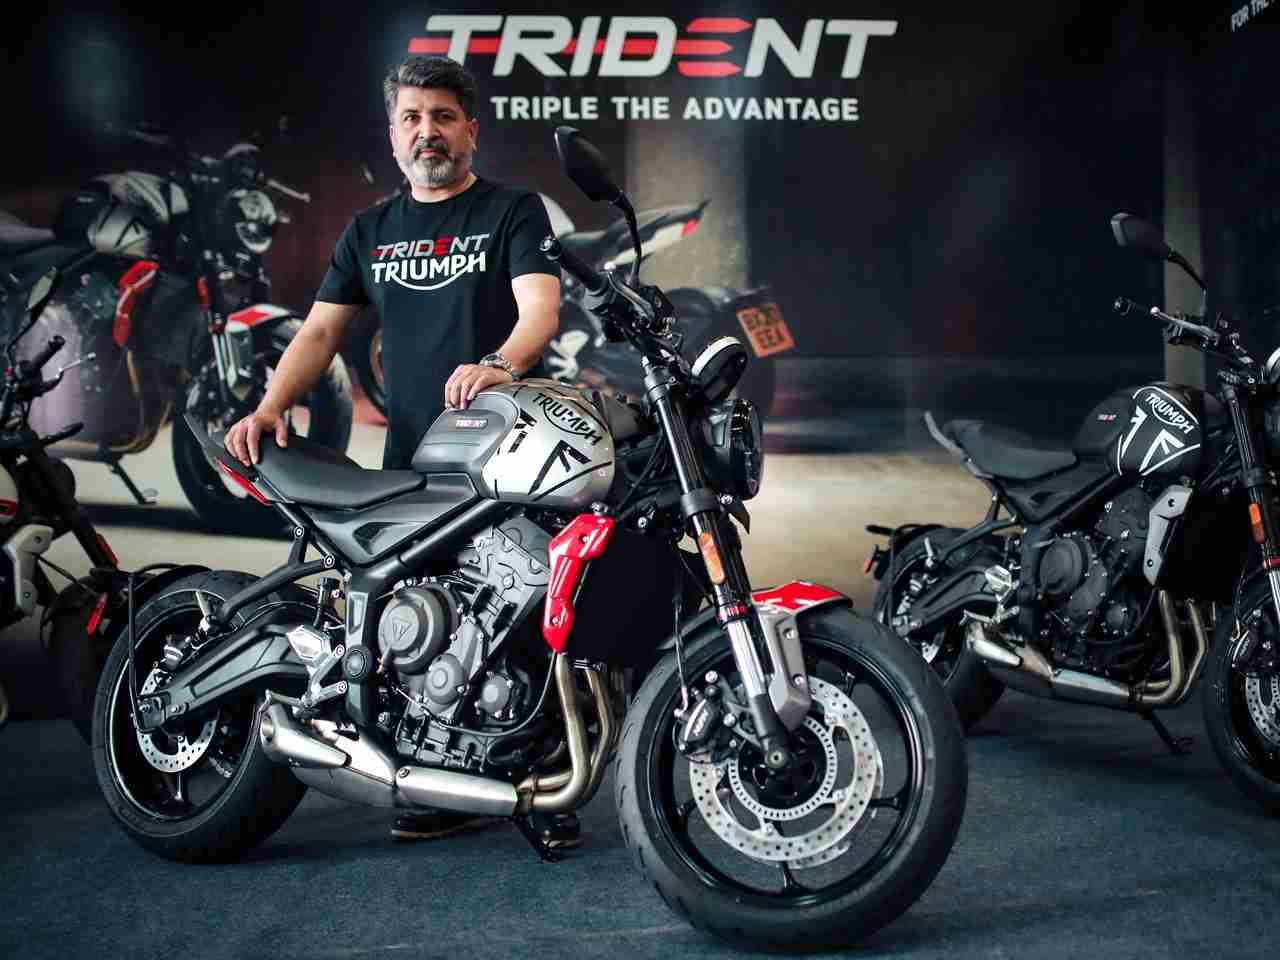 Mr. Shoeb Farooq Trident 660 India launch